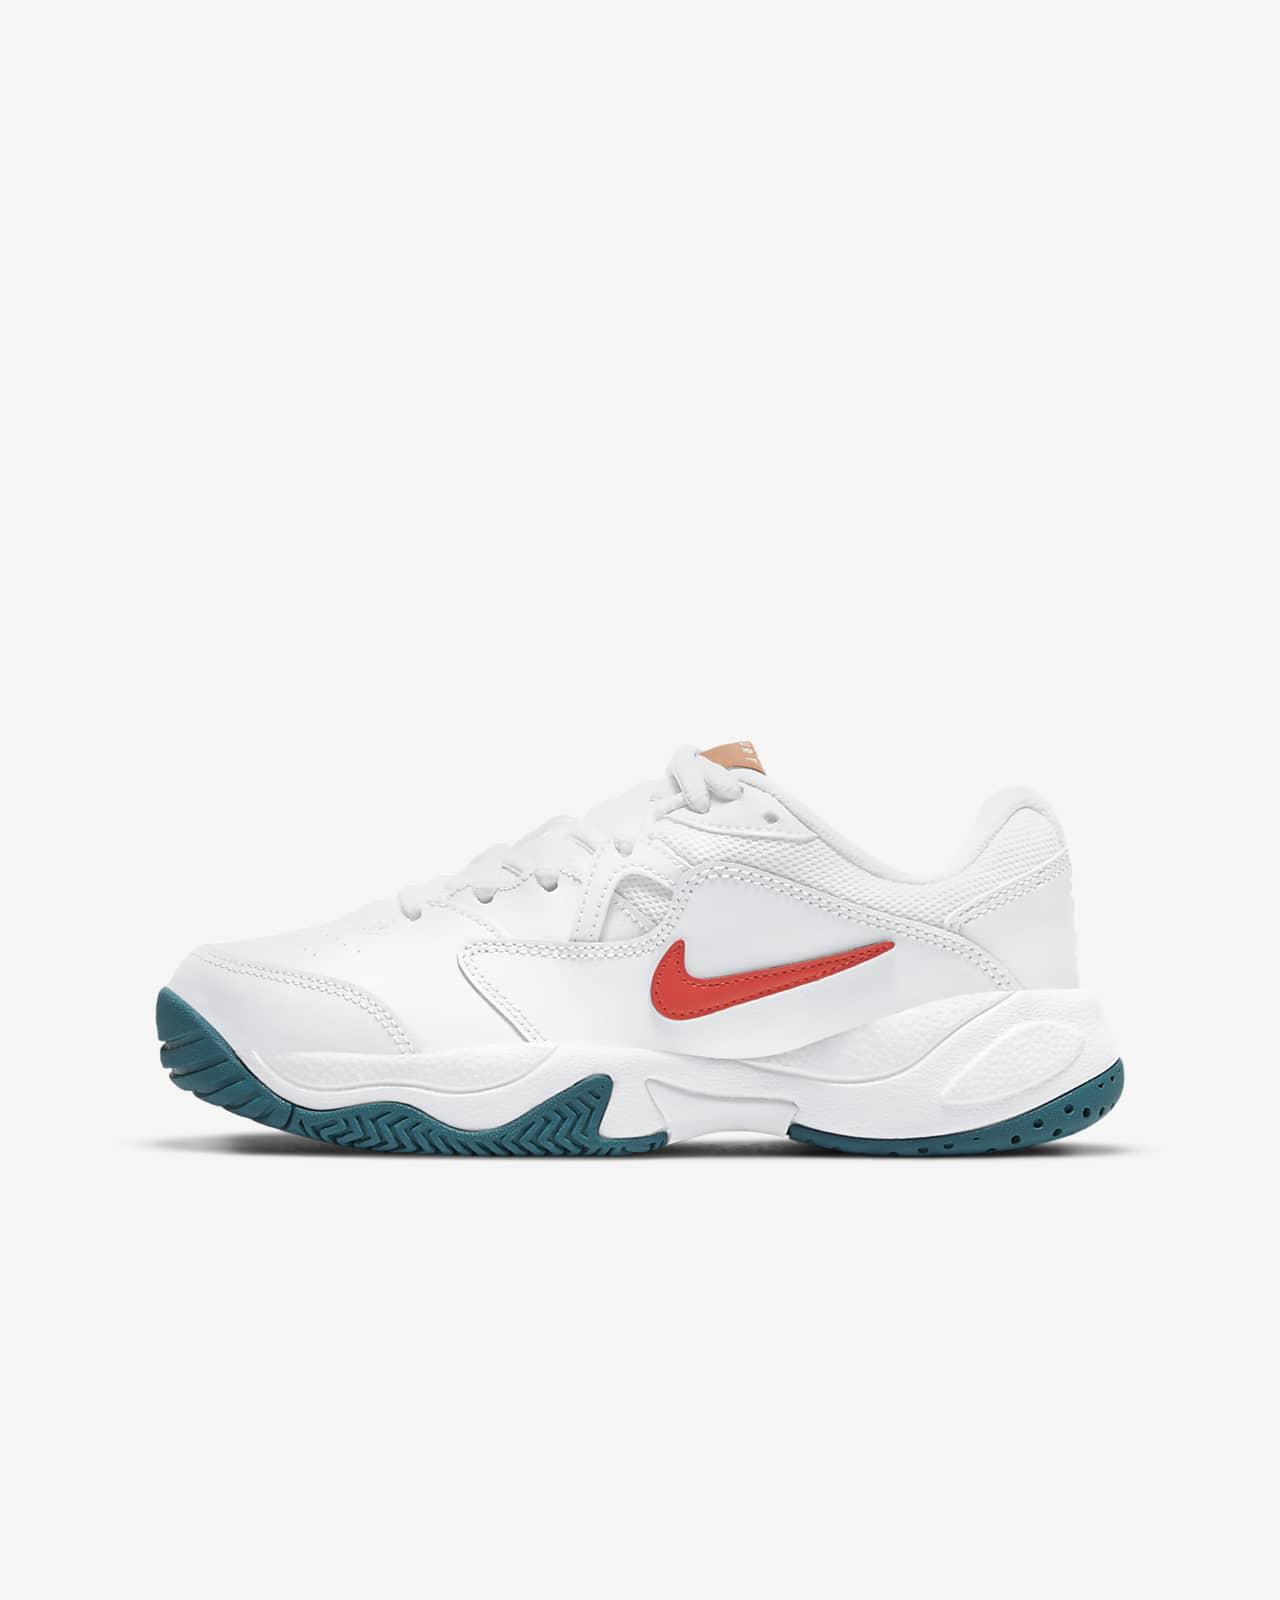 Sapatilhas de ténis NikeCourt Jr. Lite 2 Júnior